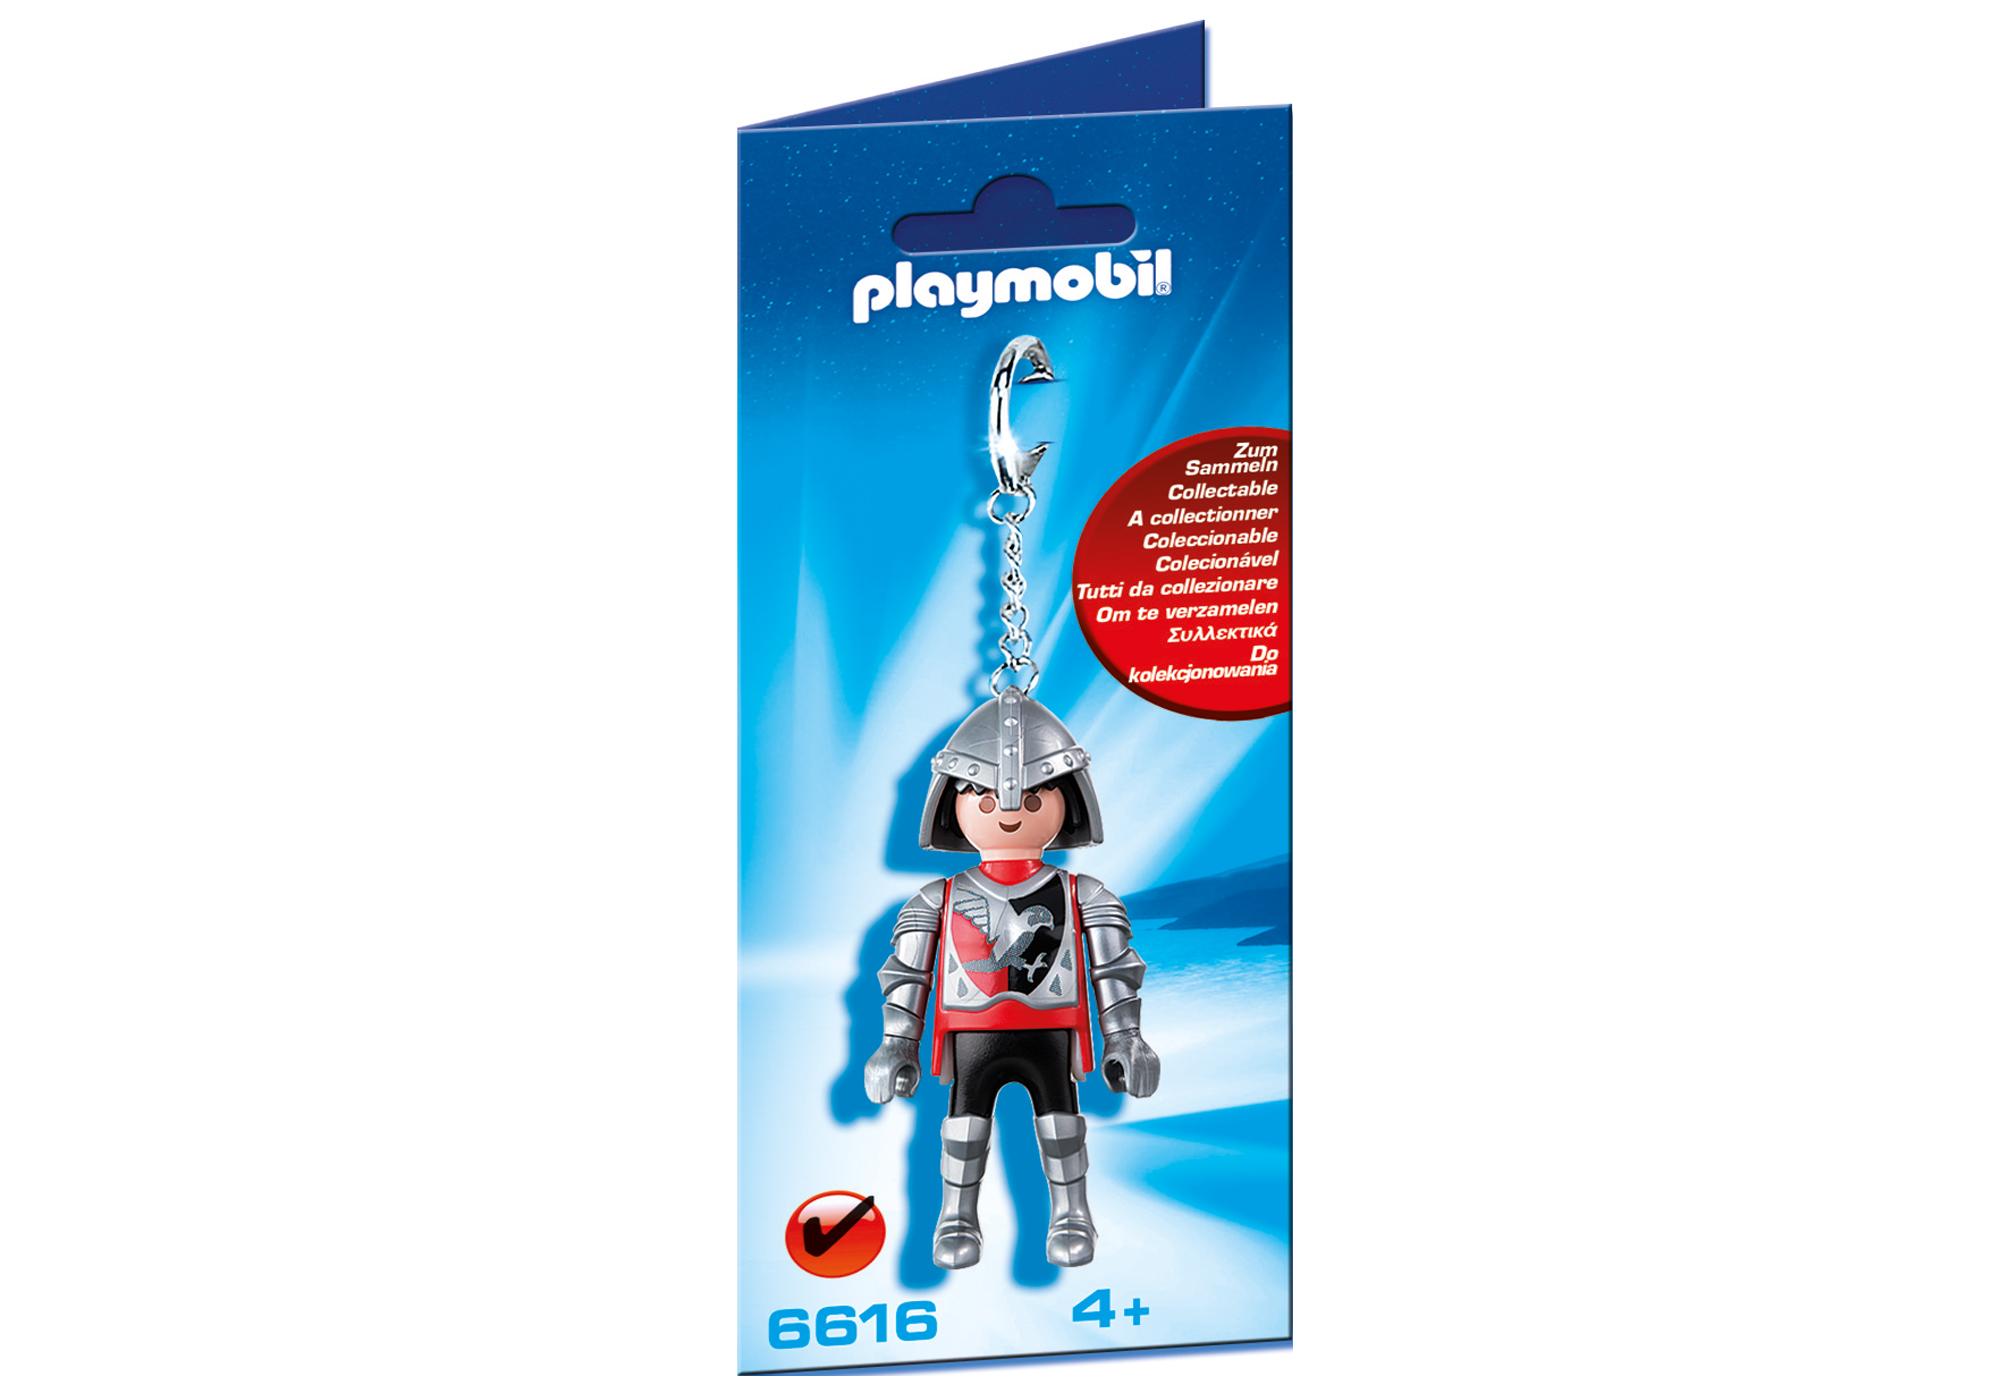 http://media.playmobil.com/i/playmobil/6616_product_box_front